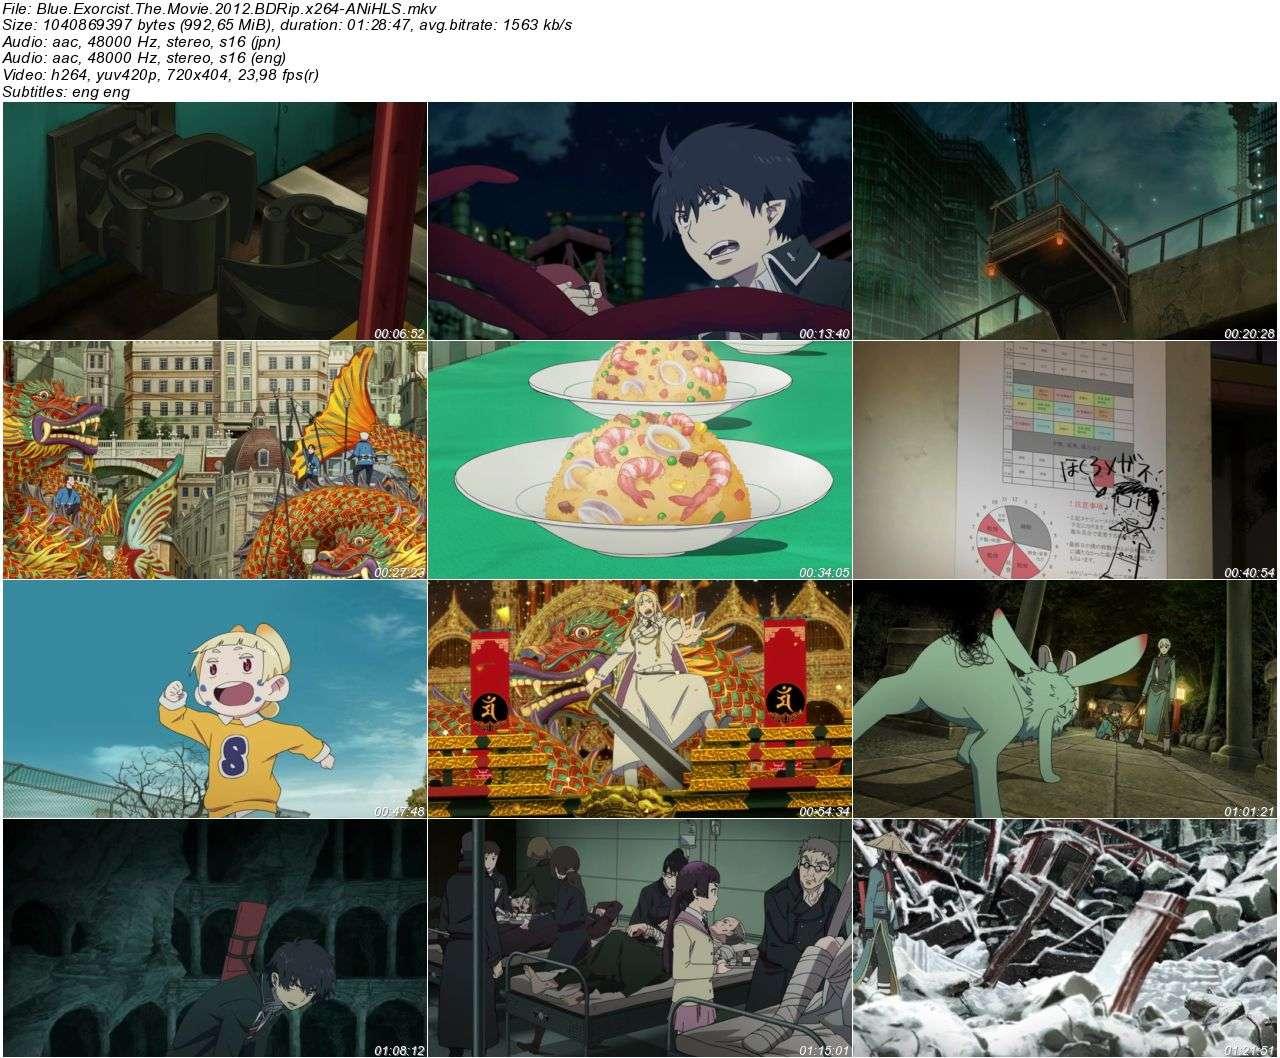 Blue Exorcist The Movie - 2012 BDRip x264 - Türkçe Altyazılı Tek Link indir